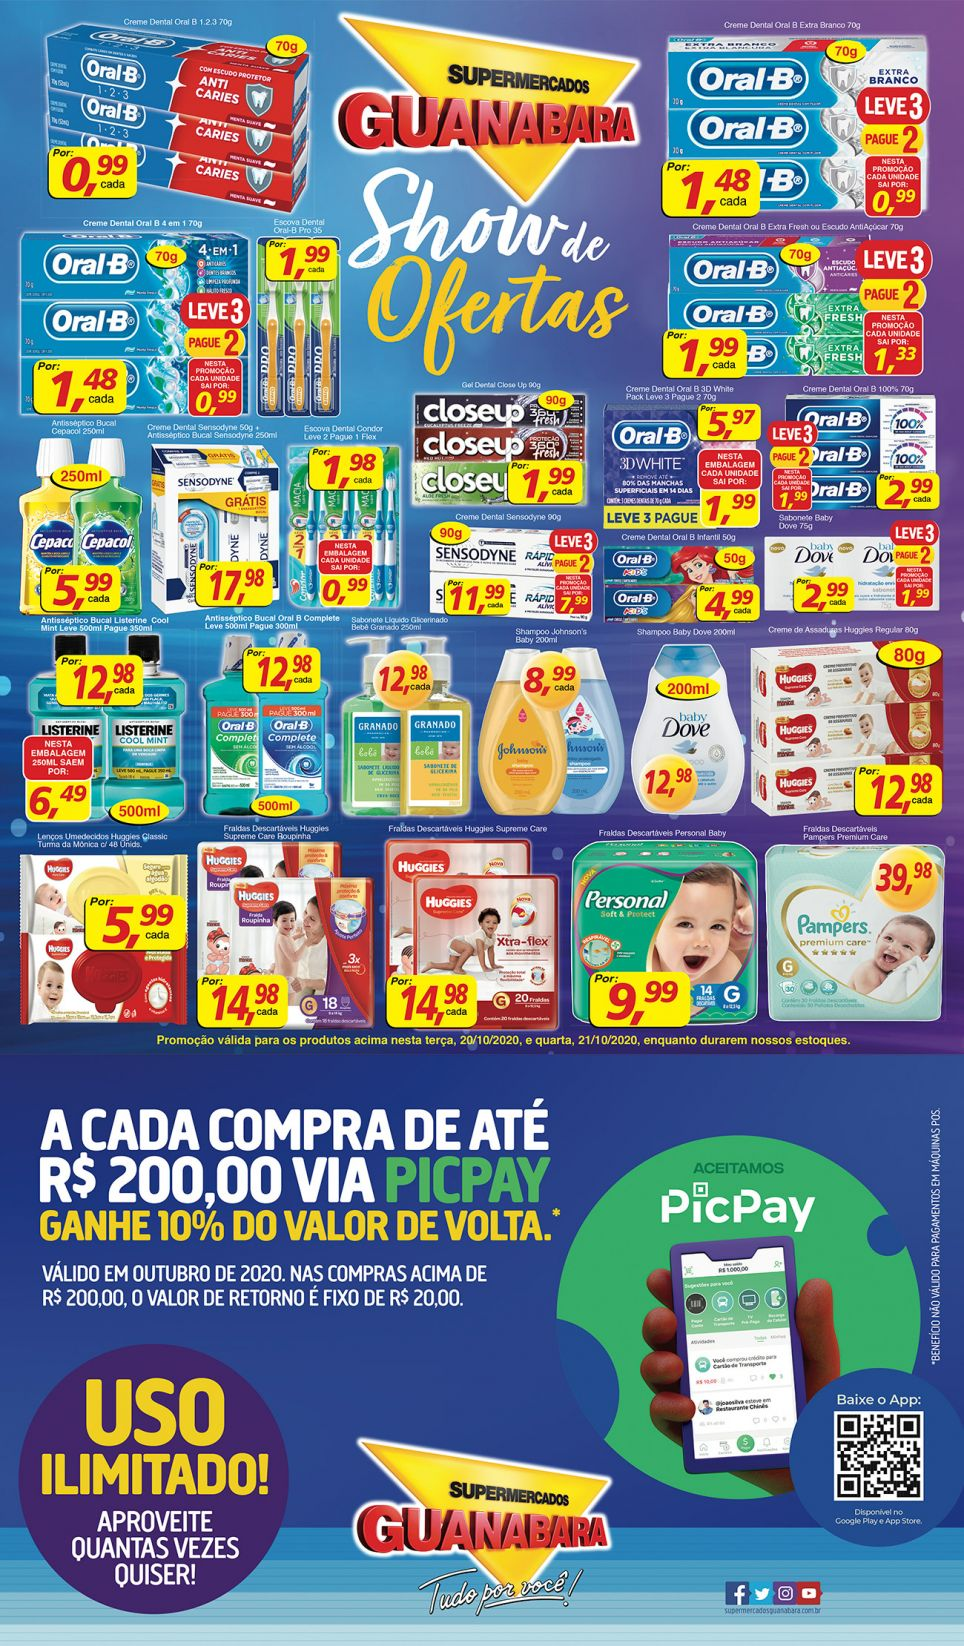 Encarte Guanabara 20/10/20 08